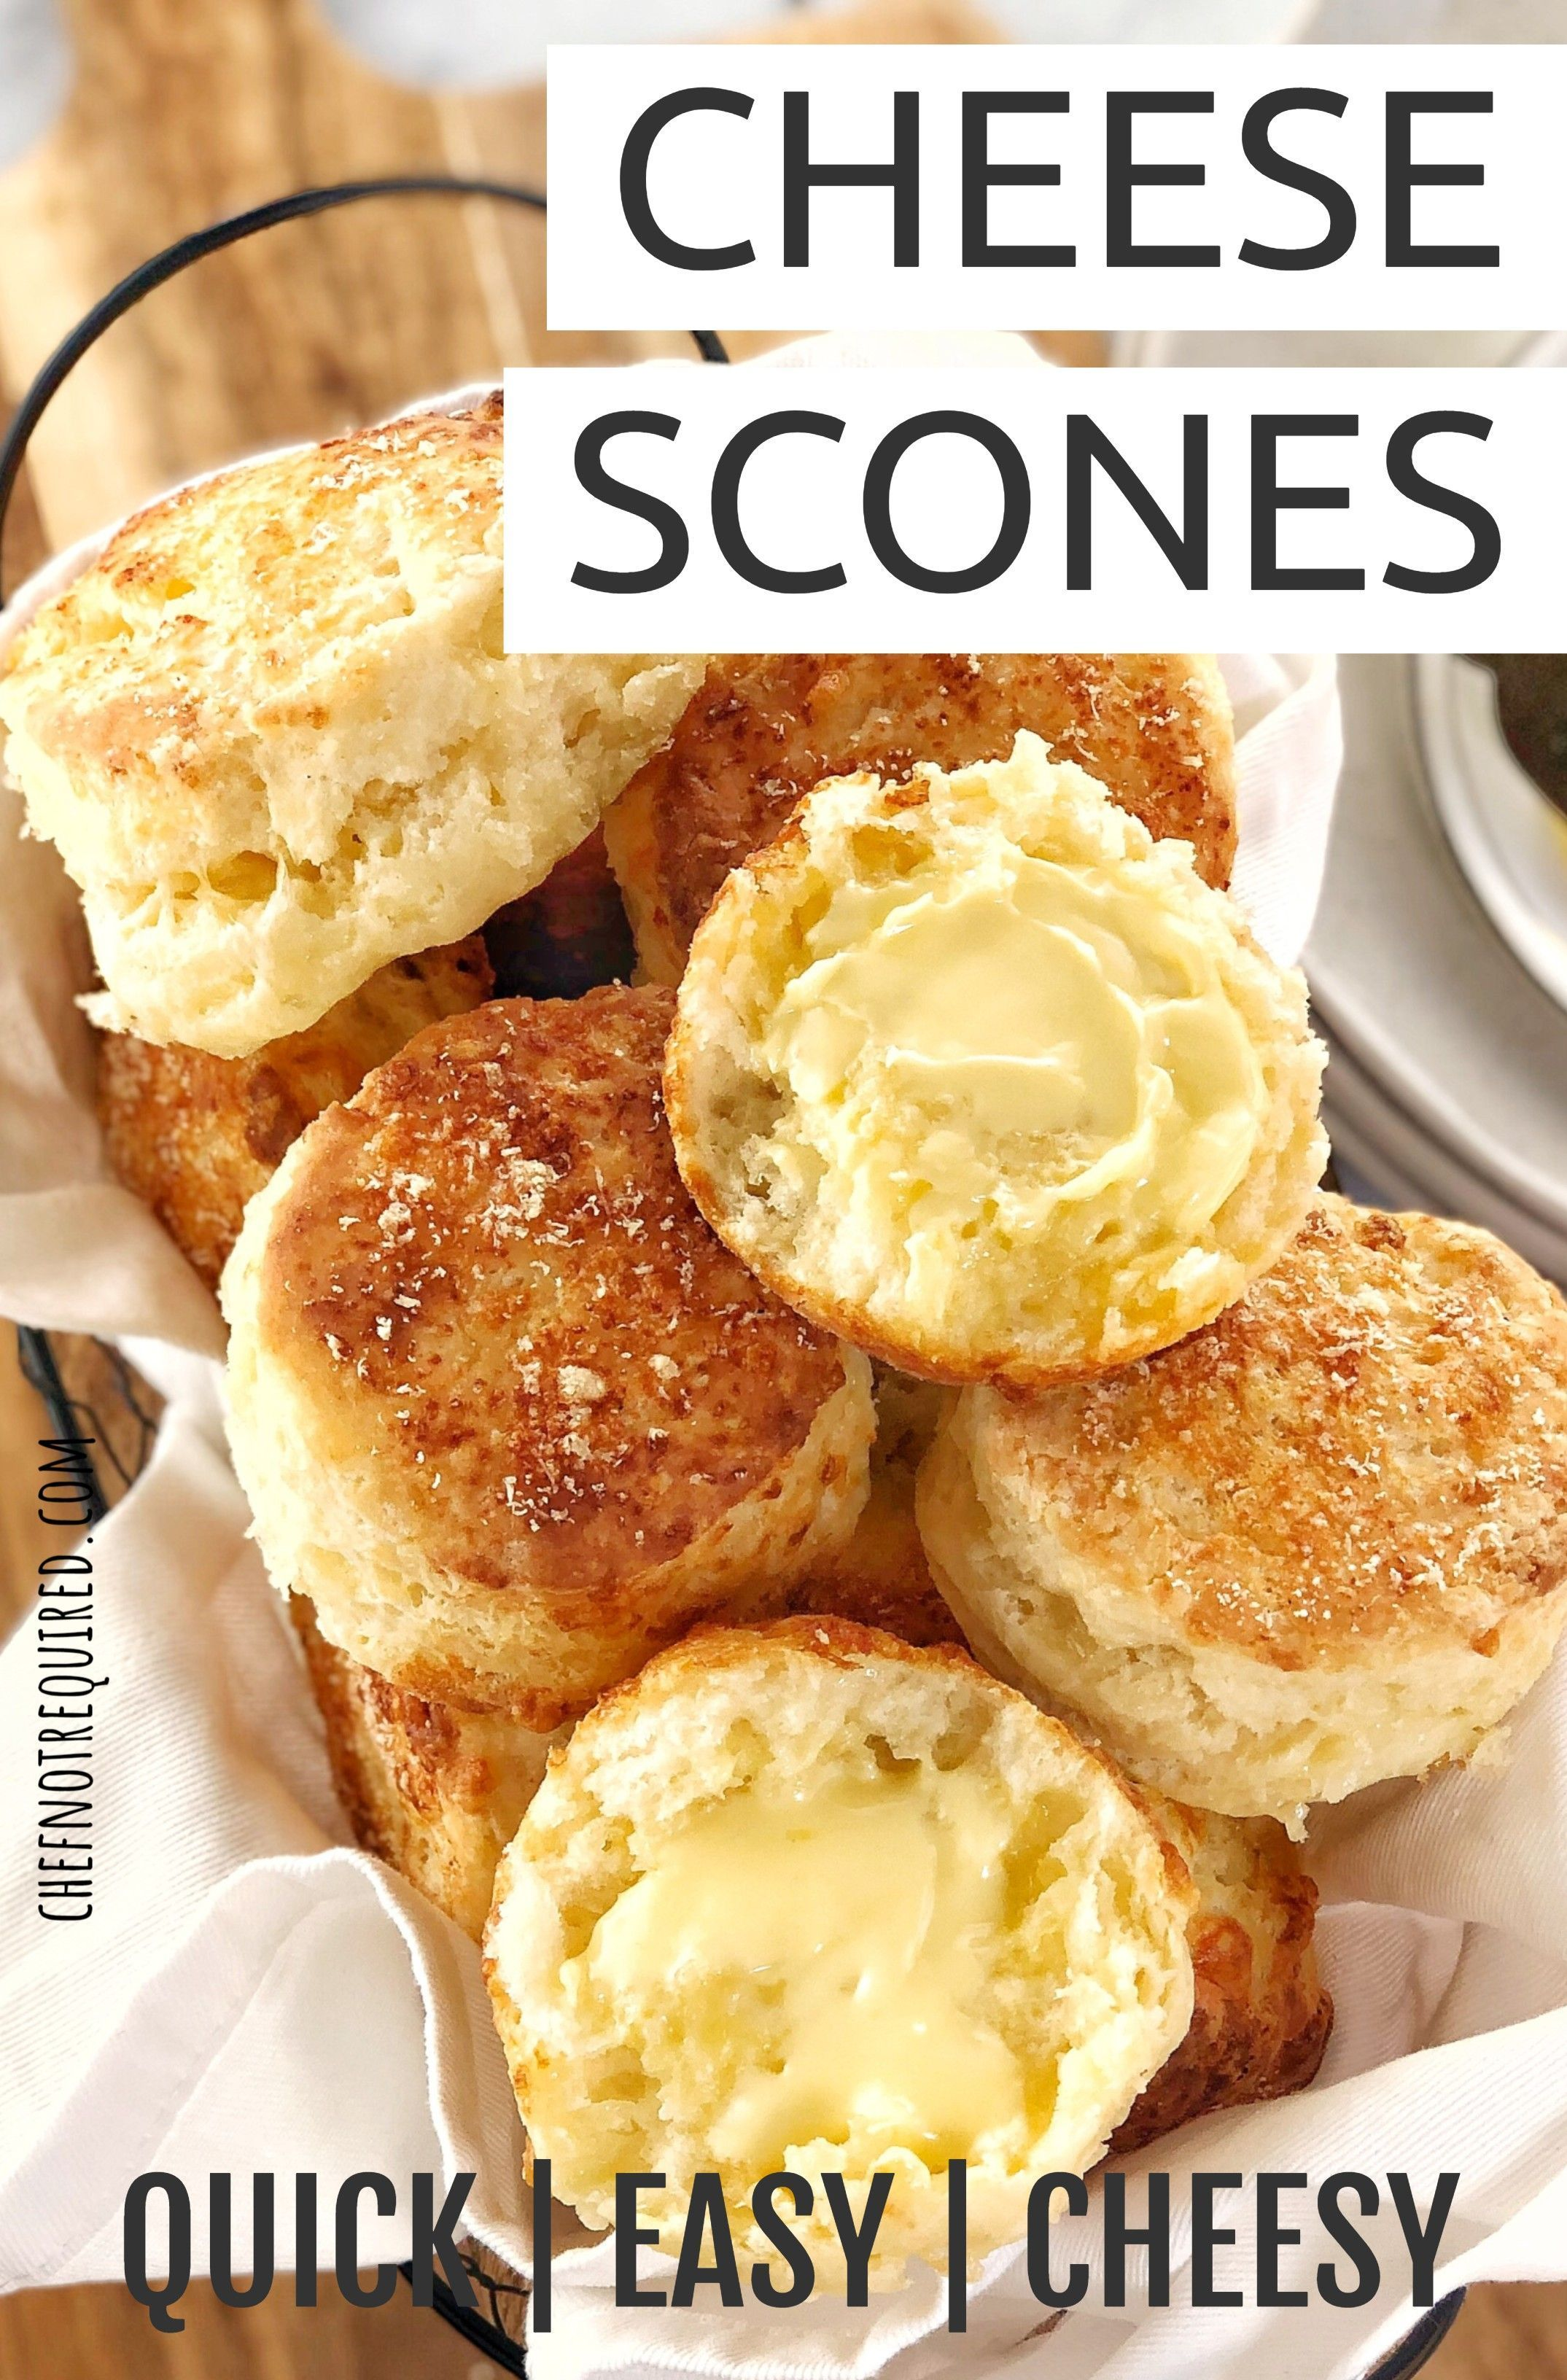 Cheese Scones In 2020 Cheese Scones Savory Snacks Scone Recipe